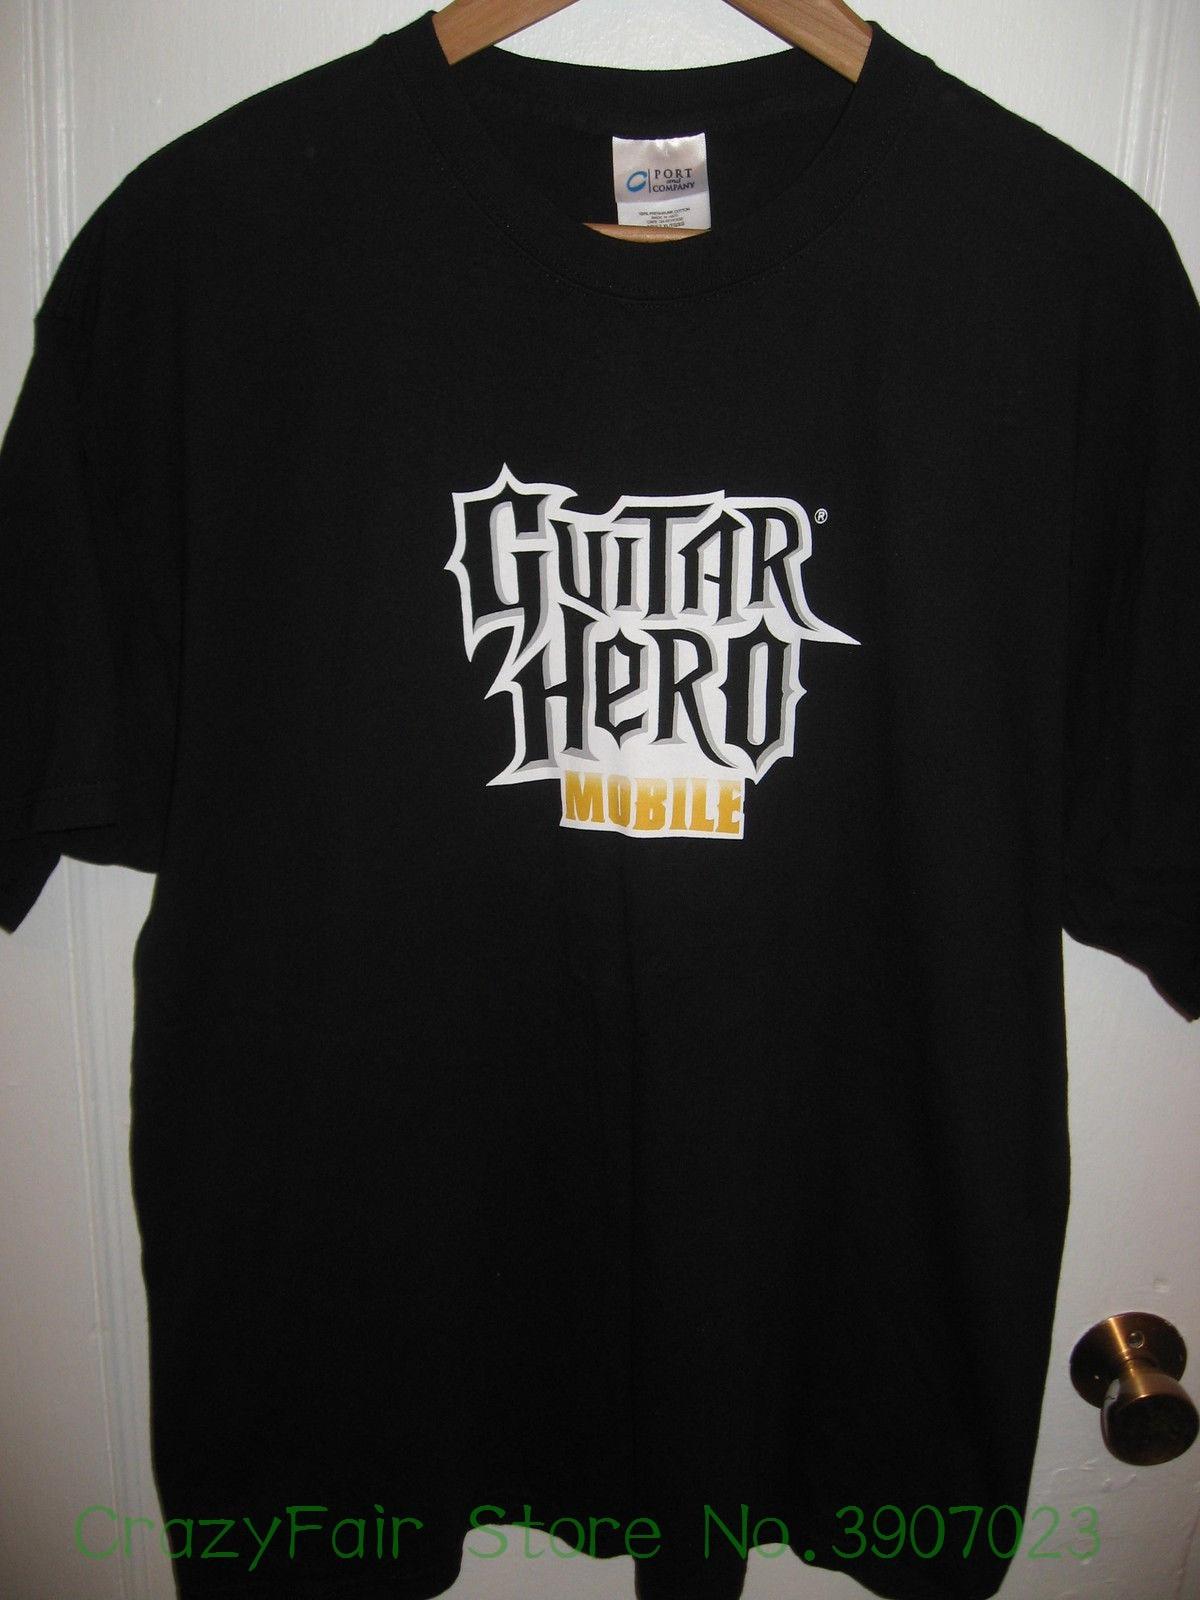 Guitar Hero Mobile Device Video Game Gamer Thumb Rehab Musician Tech T Shirt Xl Mens Sho ...